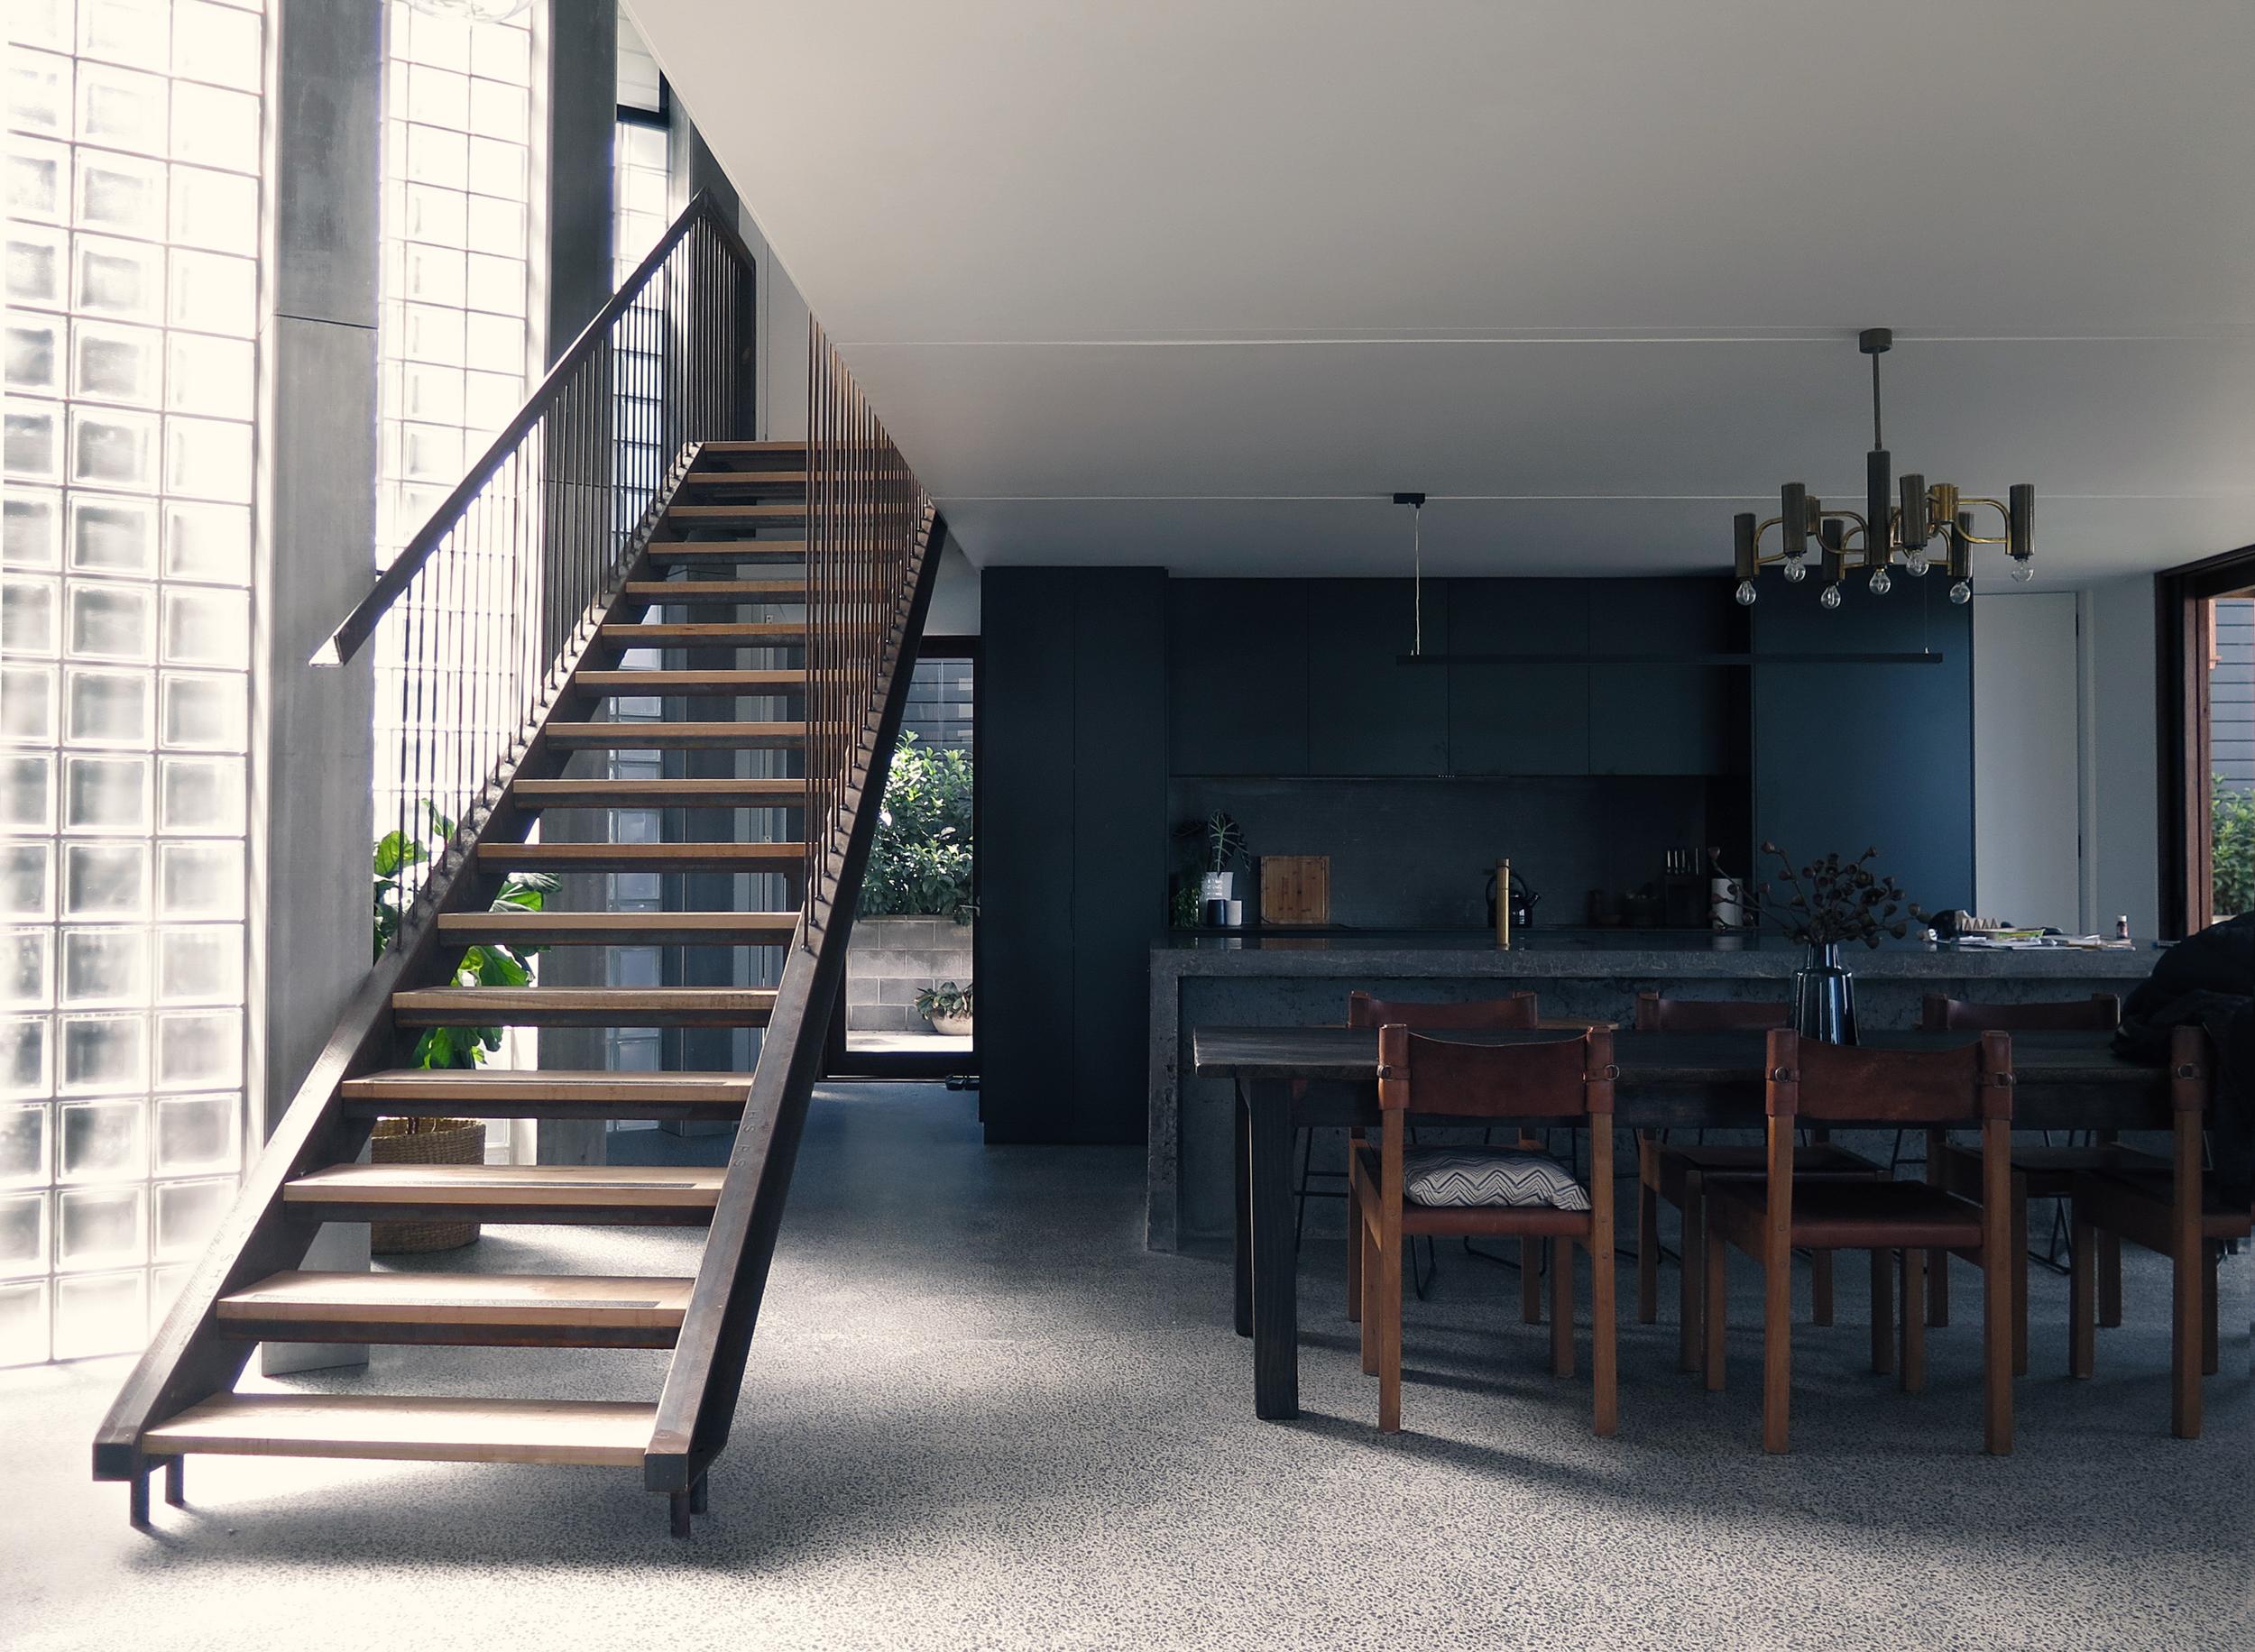 Takt Coledale Blade House Kitchen steel stair.jpg